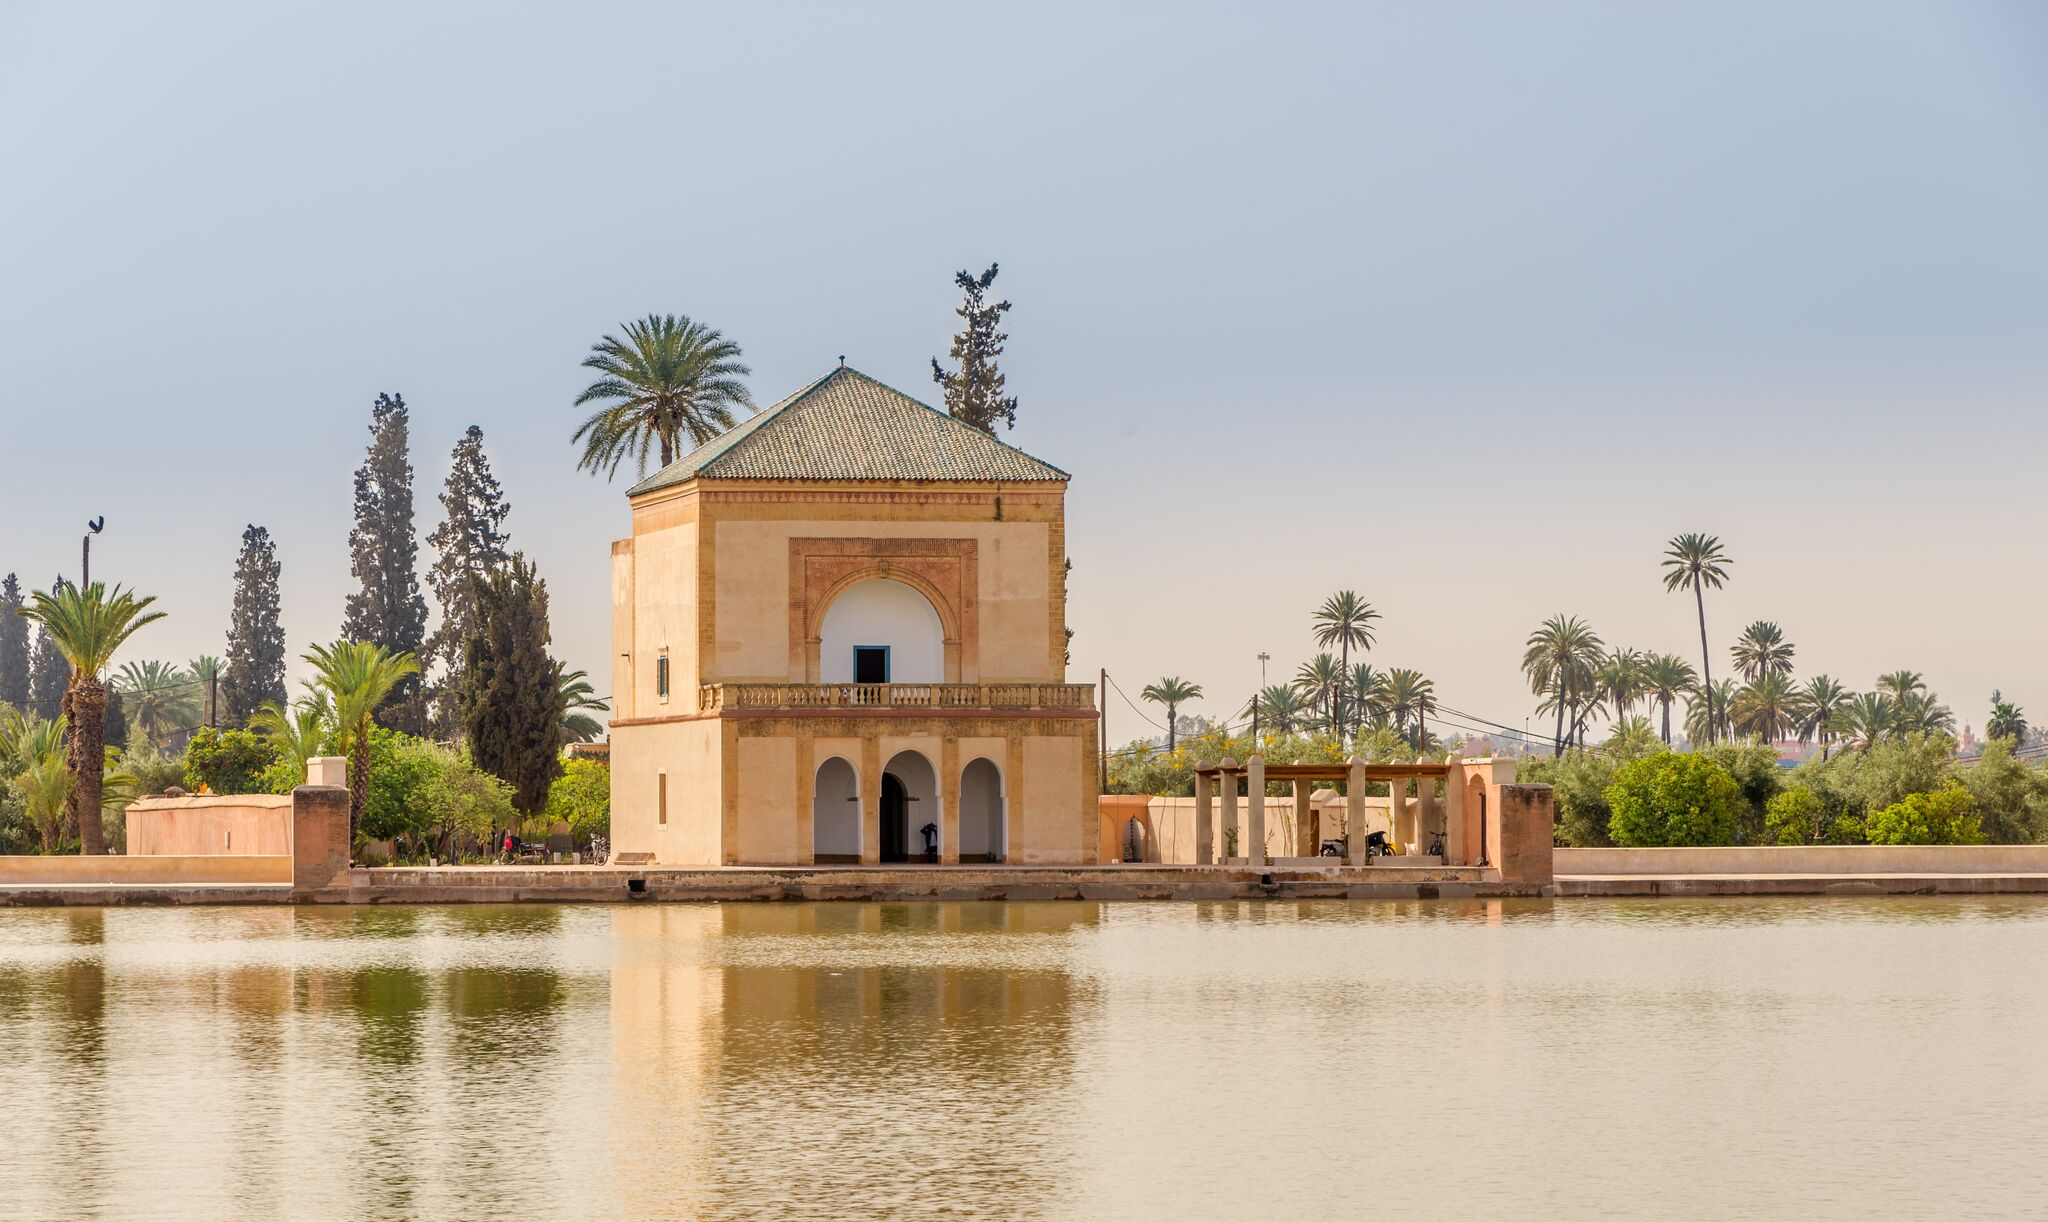 Marokko-menara.jpg